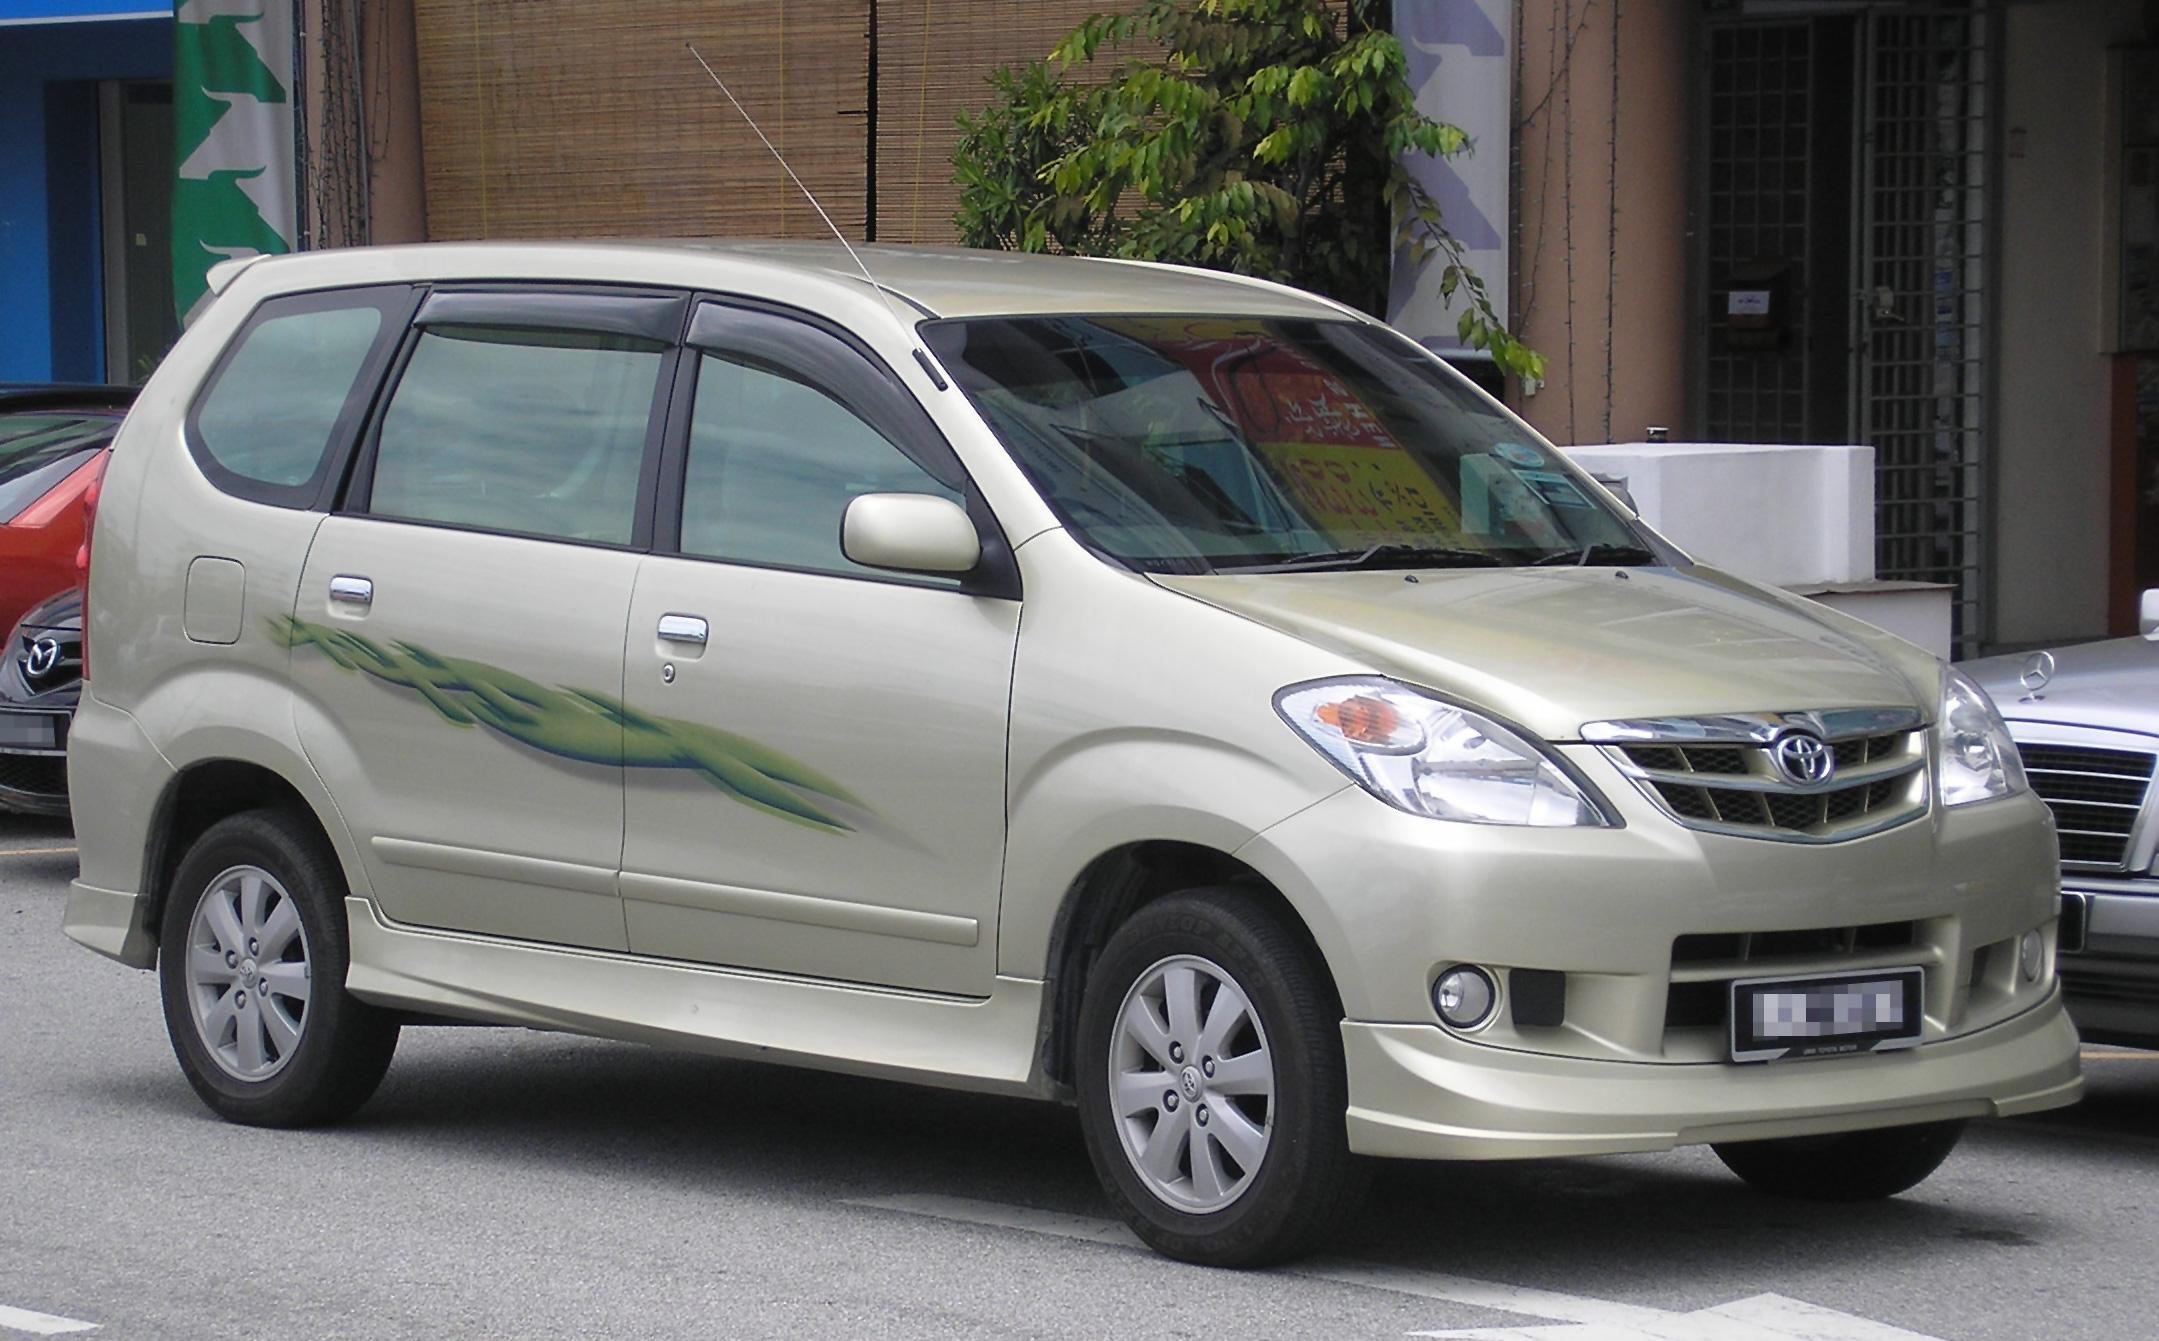 Car body sticker design malaysia - Avanza Sleeping Gif